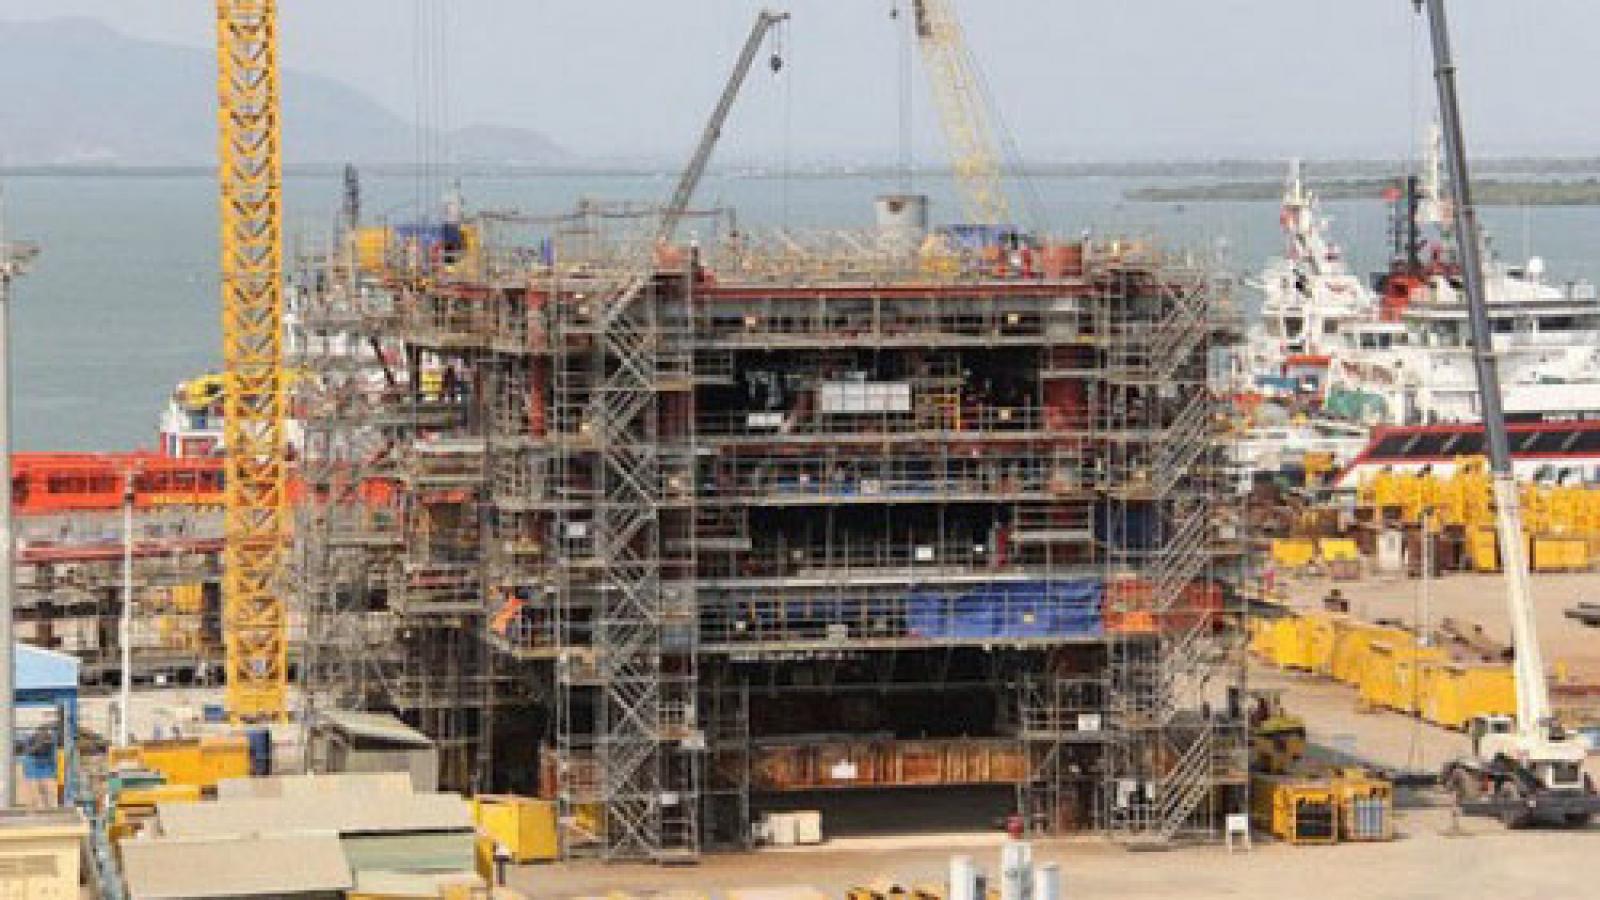 Vietnam to hand over US$100mn oil rig to Brunei in June